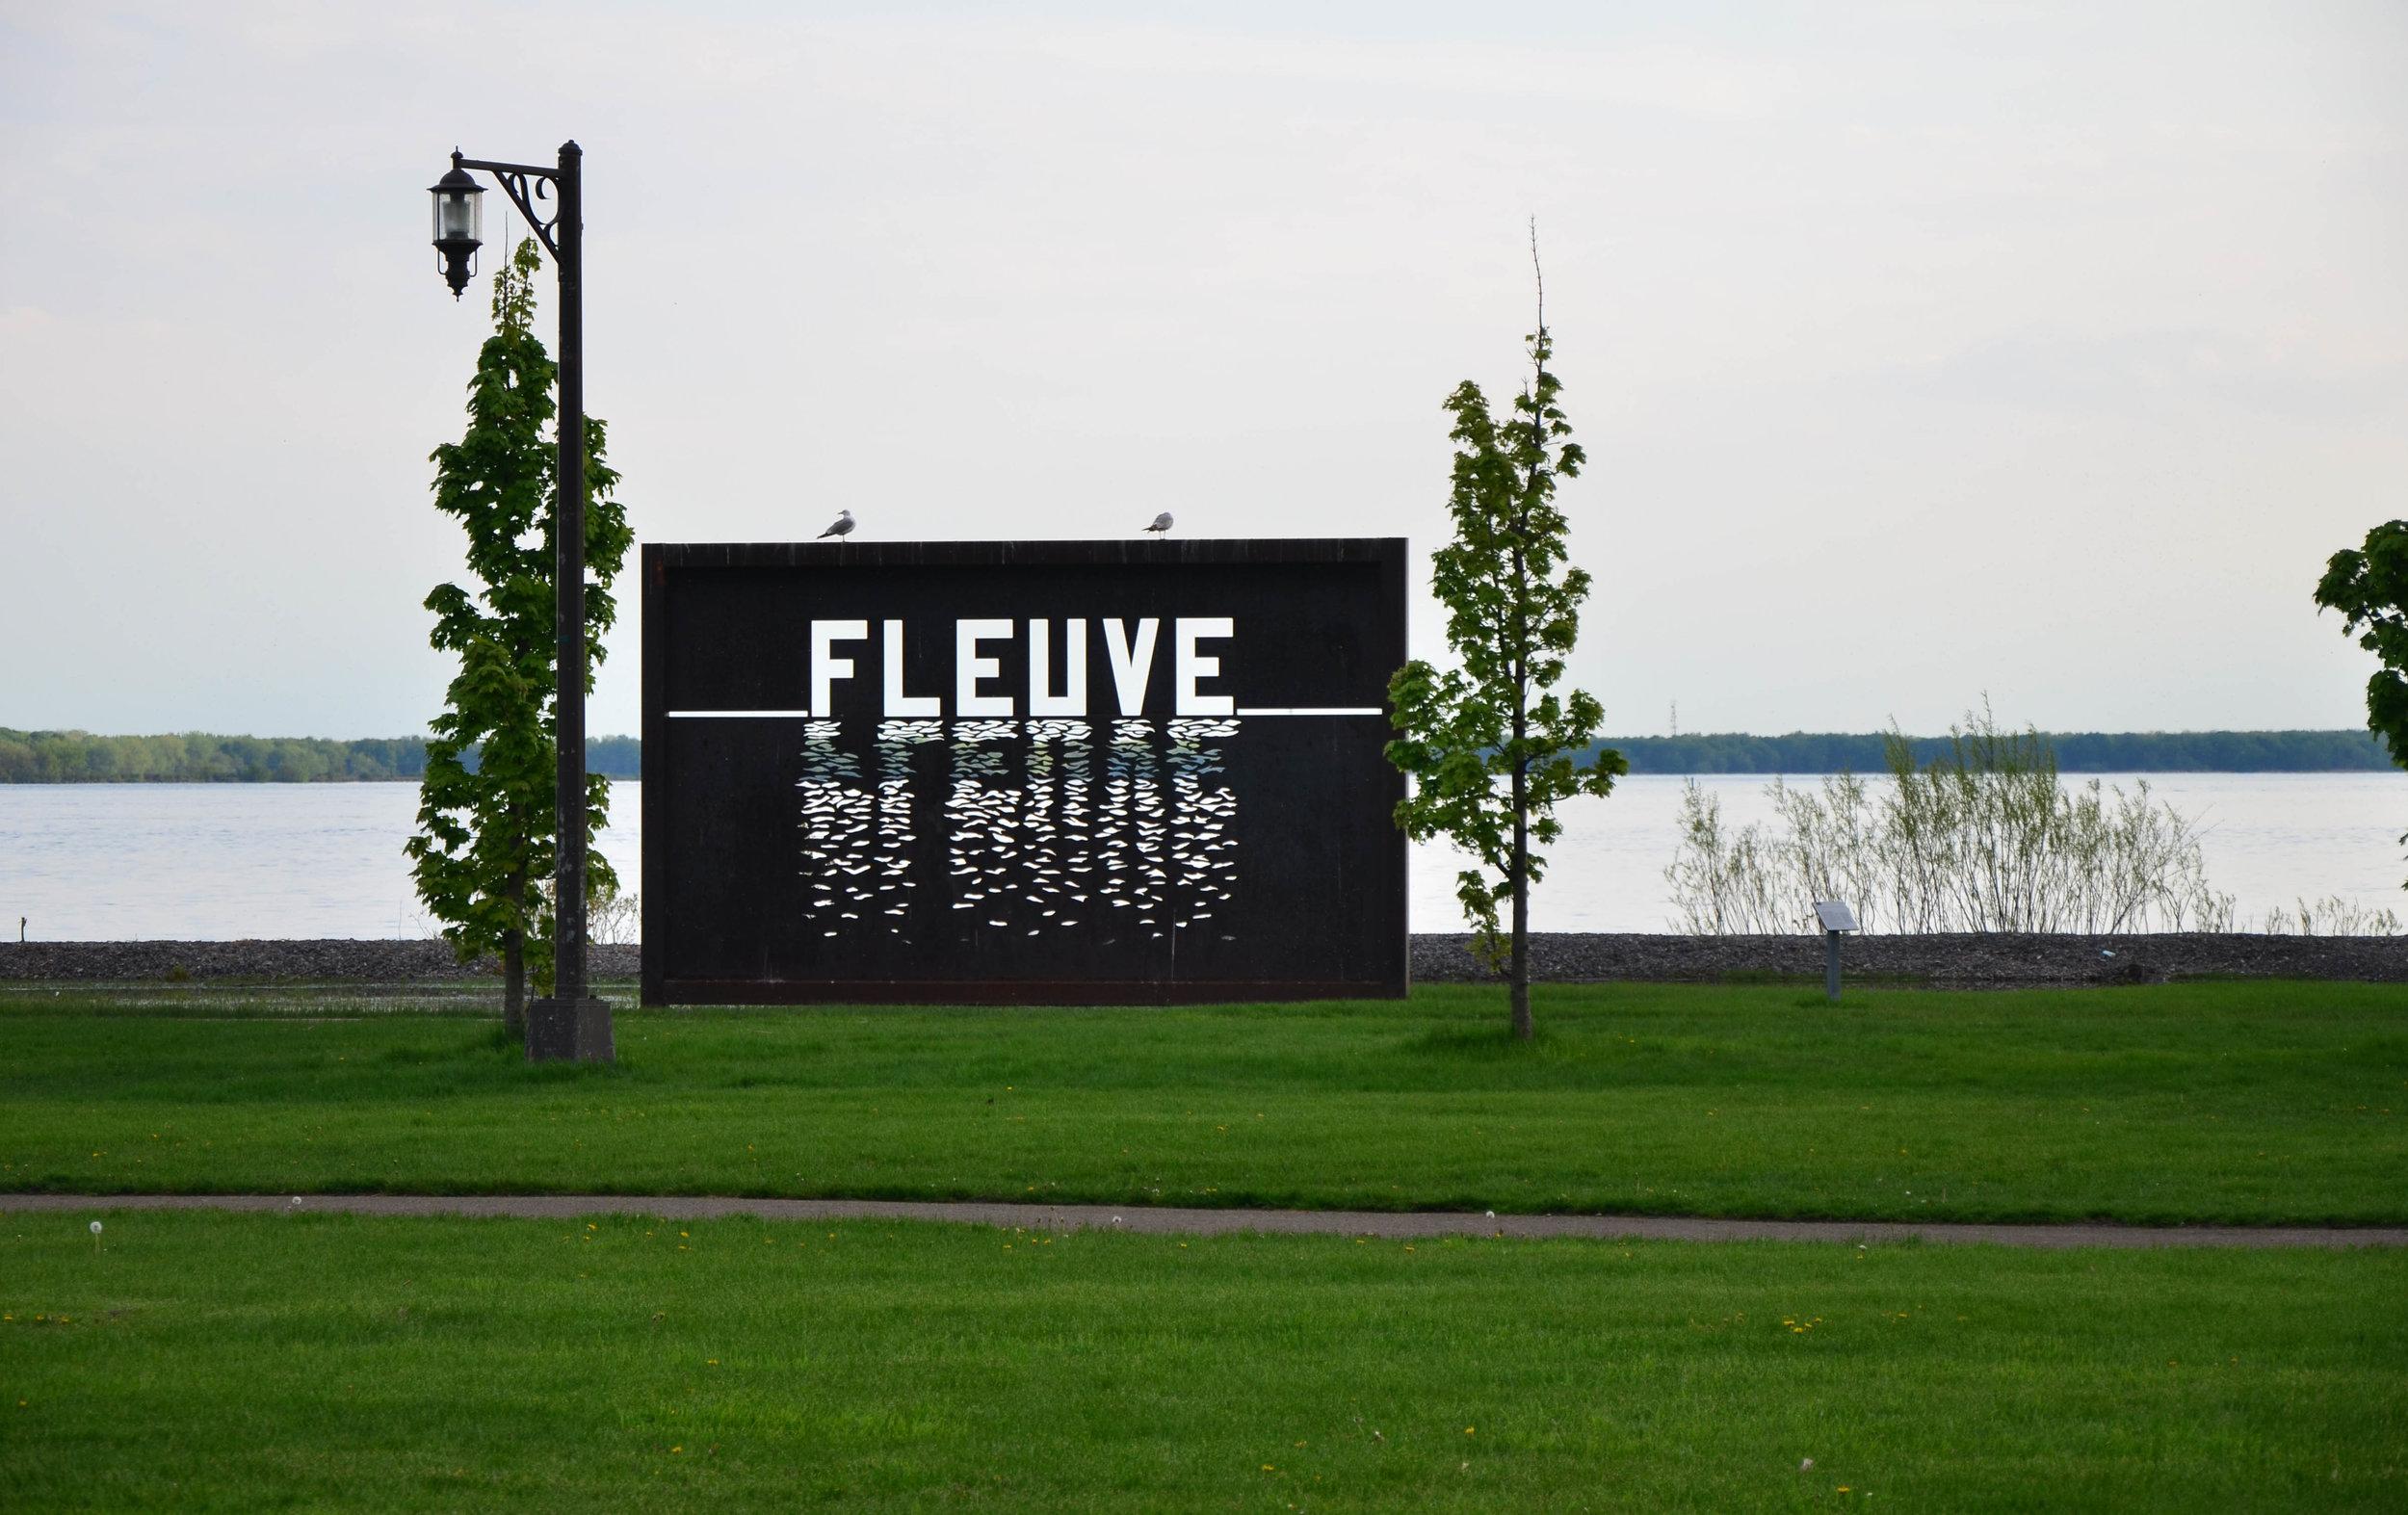 ALL_Montreal_2017-05_Sainte_Anne-de-Bellevue_WEB-155.jpg